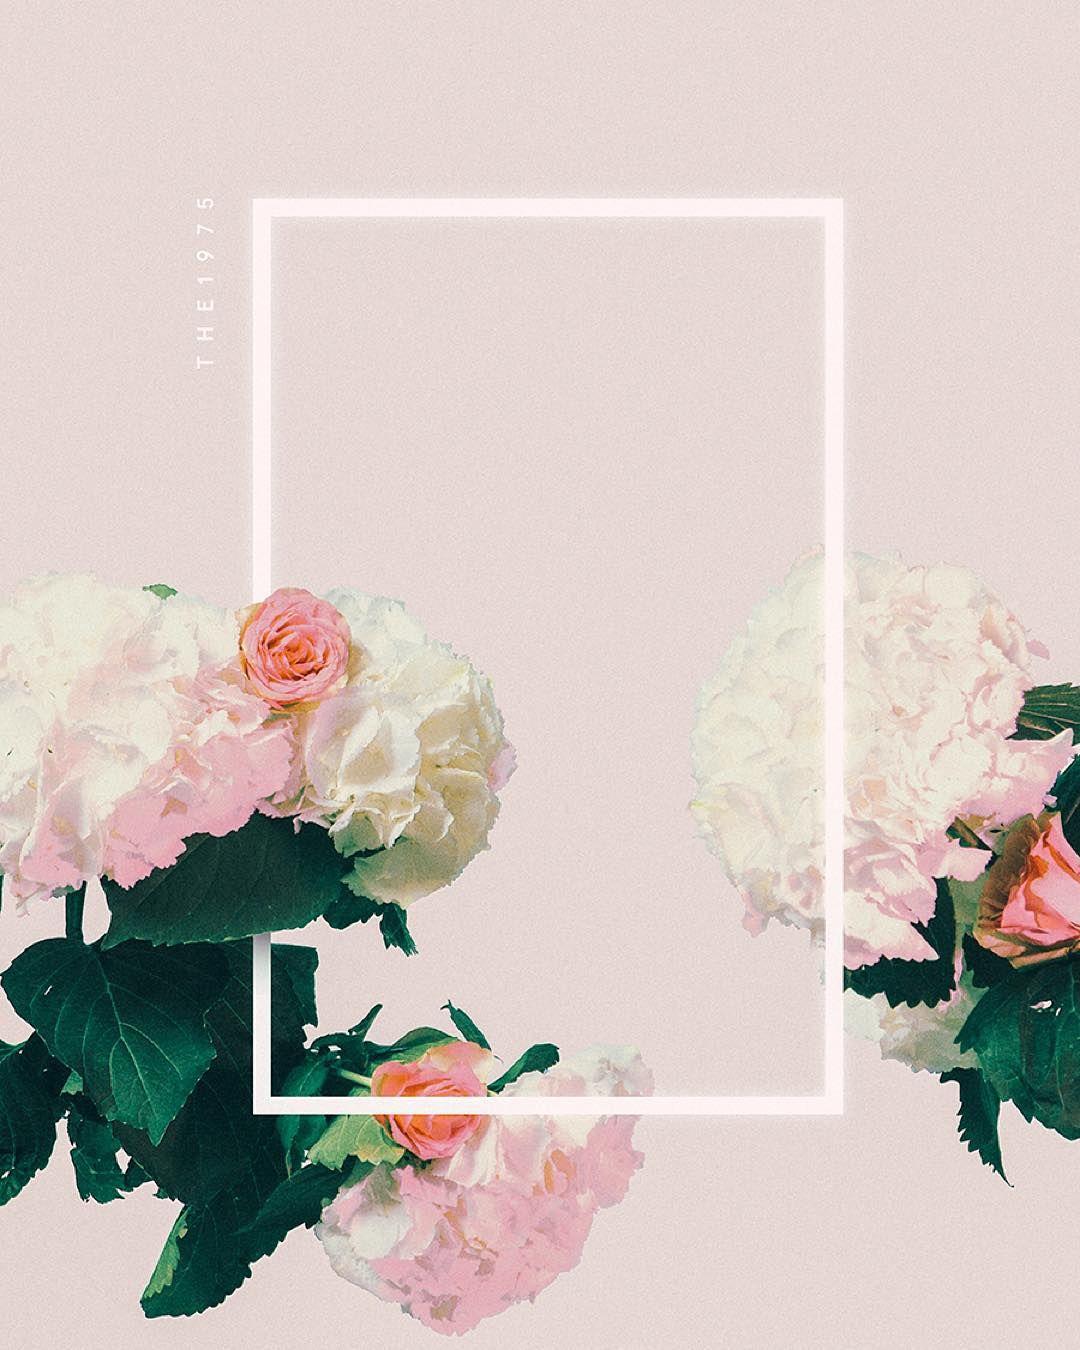 Pinterest girlyblonde Insta giirlyblonde22 Aesthetic 1080x1350